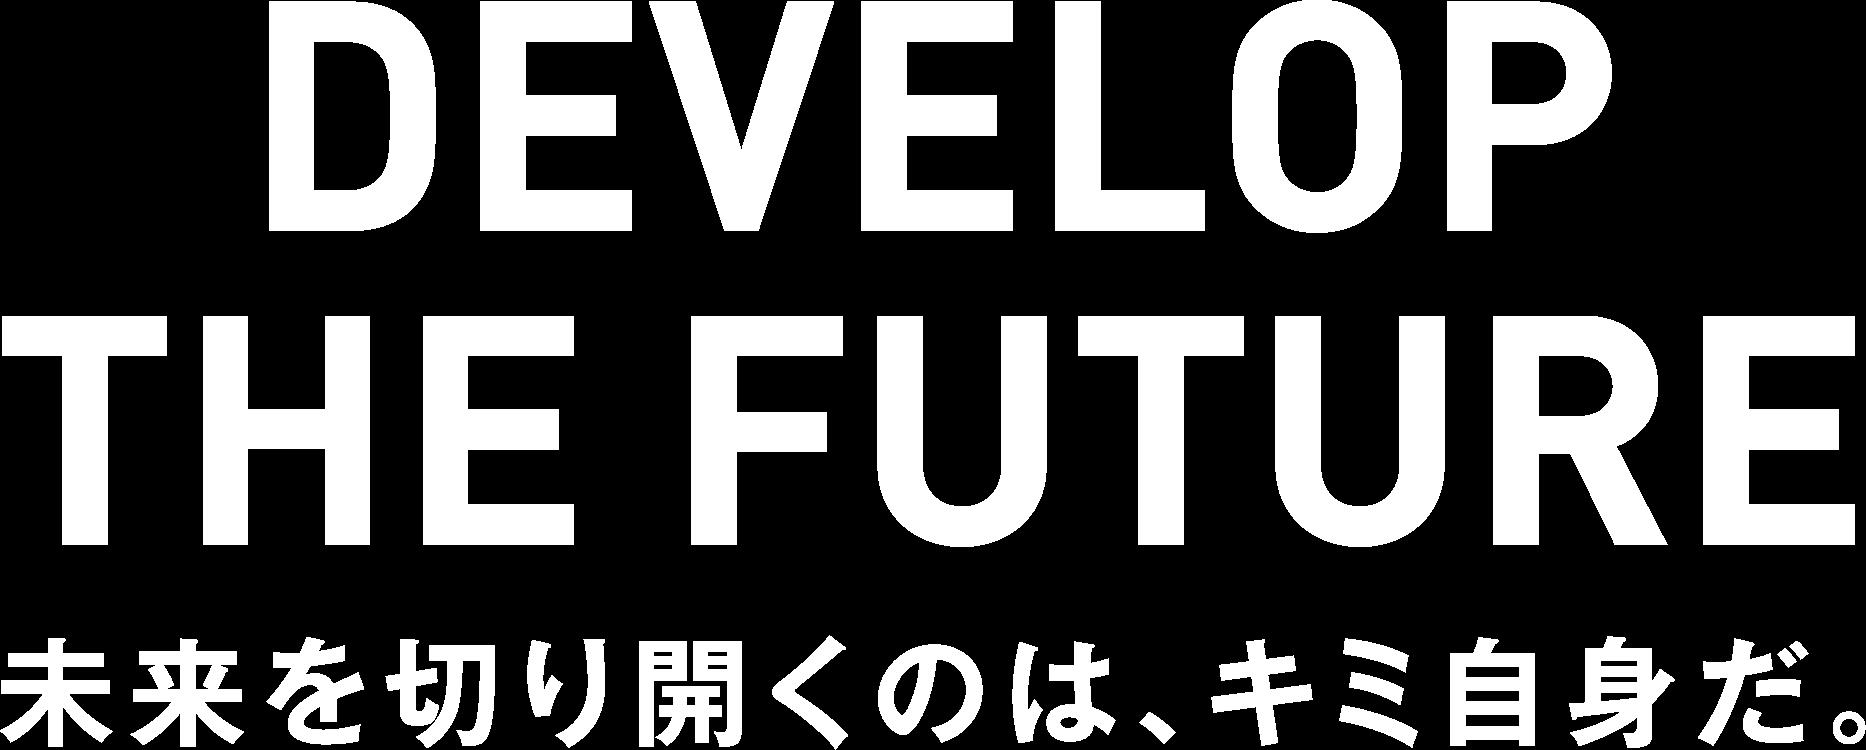 DEVELOP THE FUTURE 未来を切り開くのは、キミ自身だ。